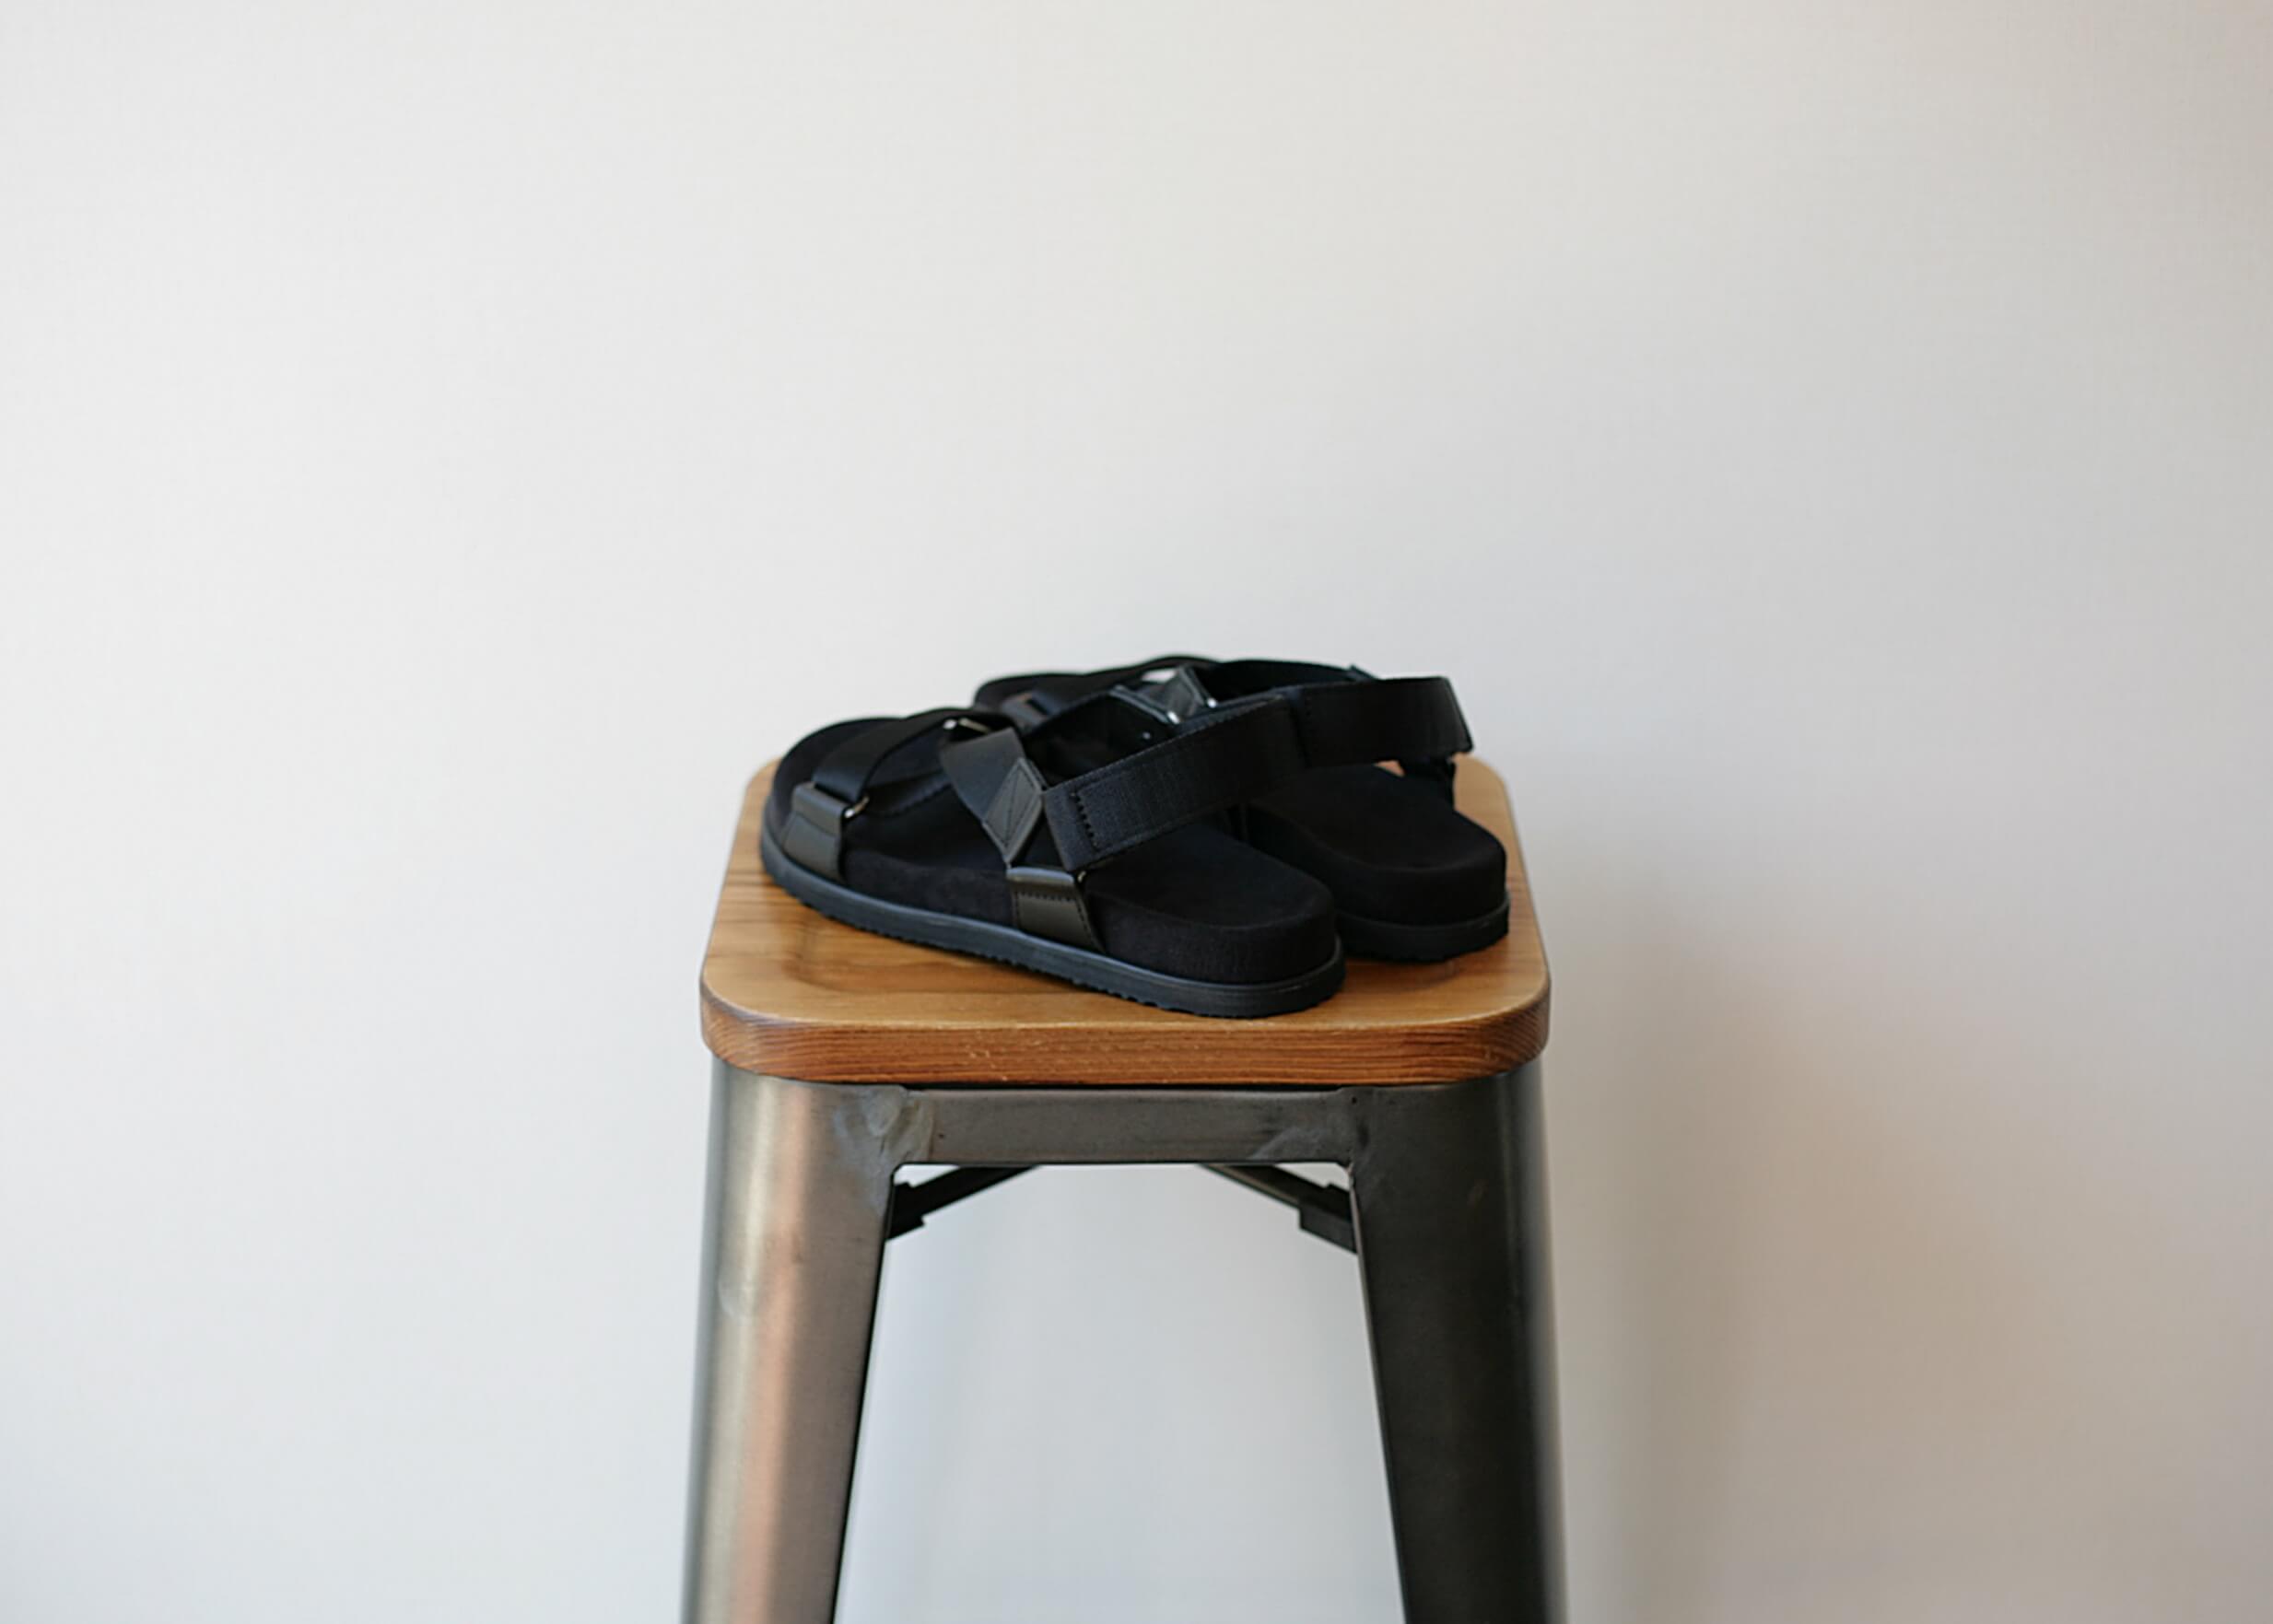 double foot wear becの斜め後ろからの写真